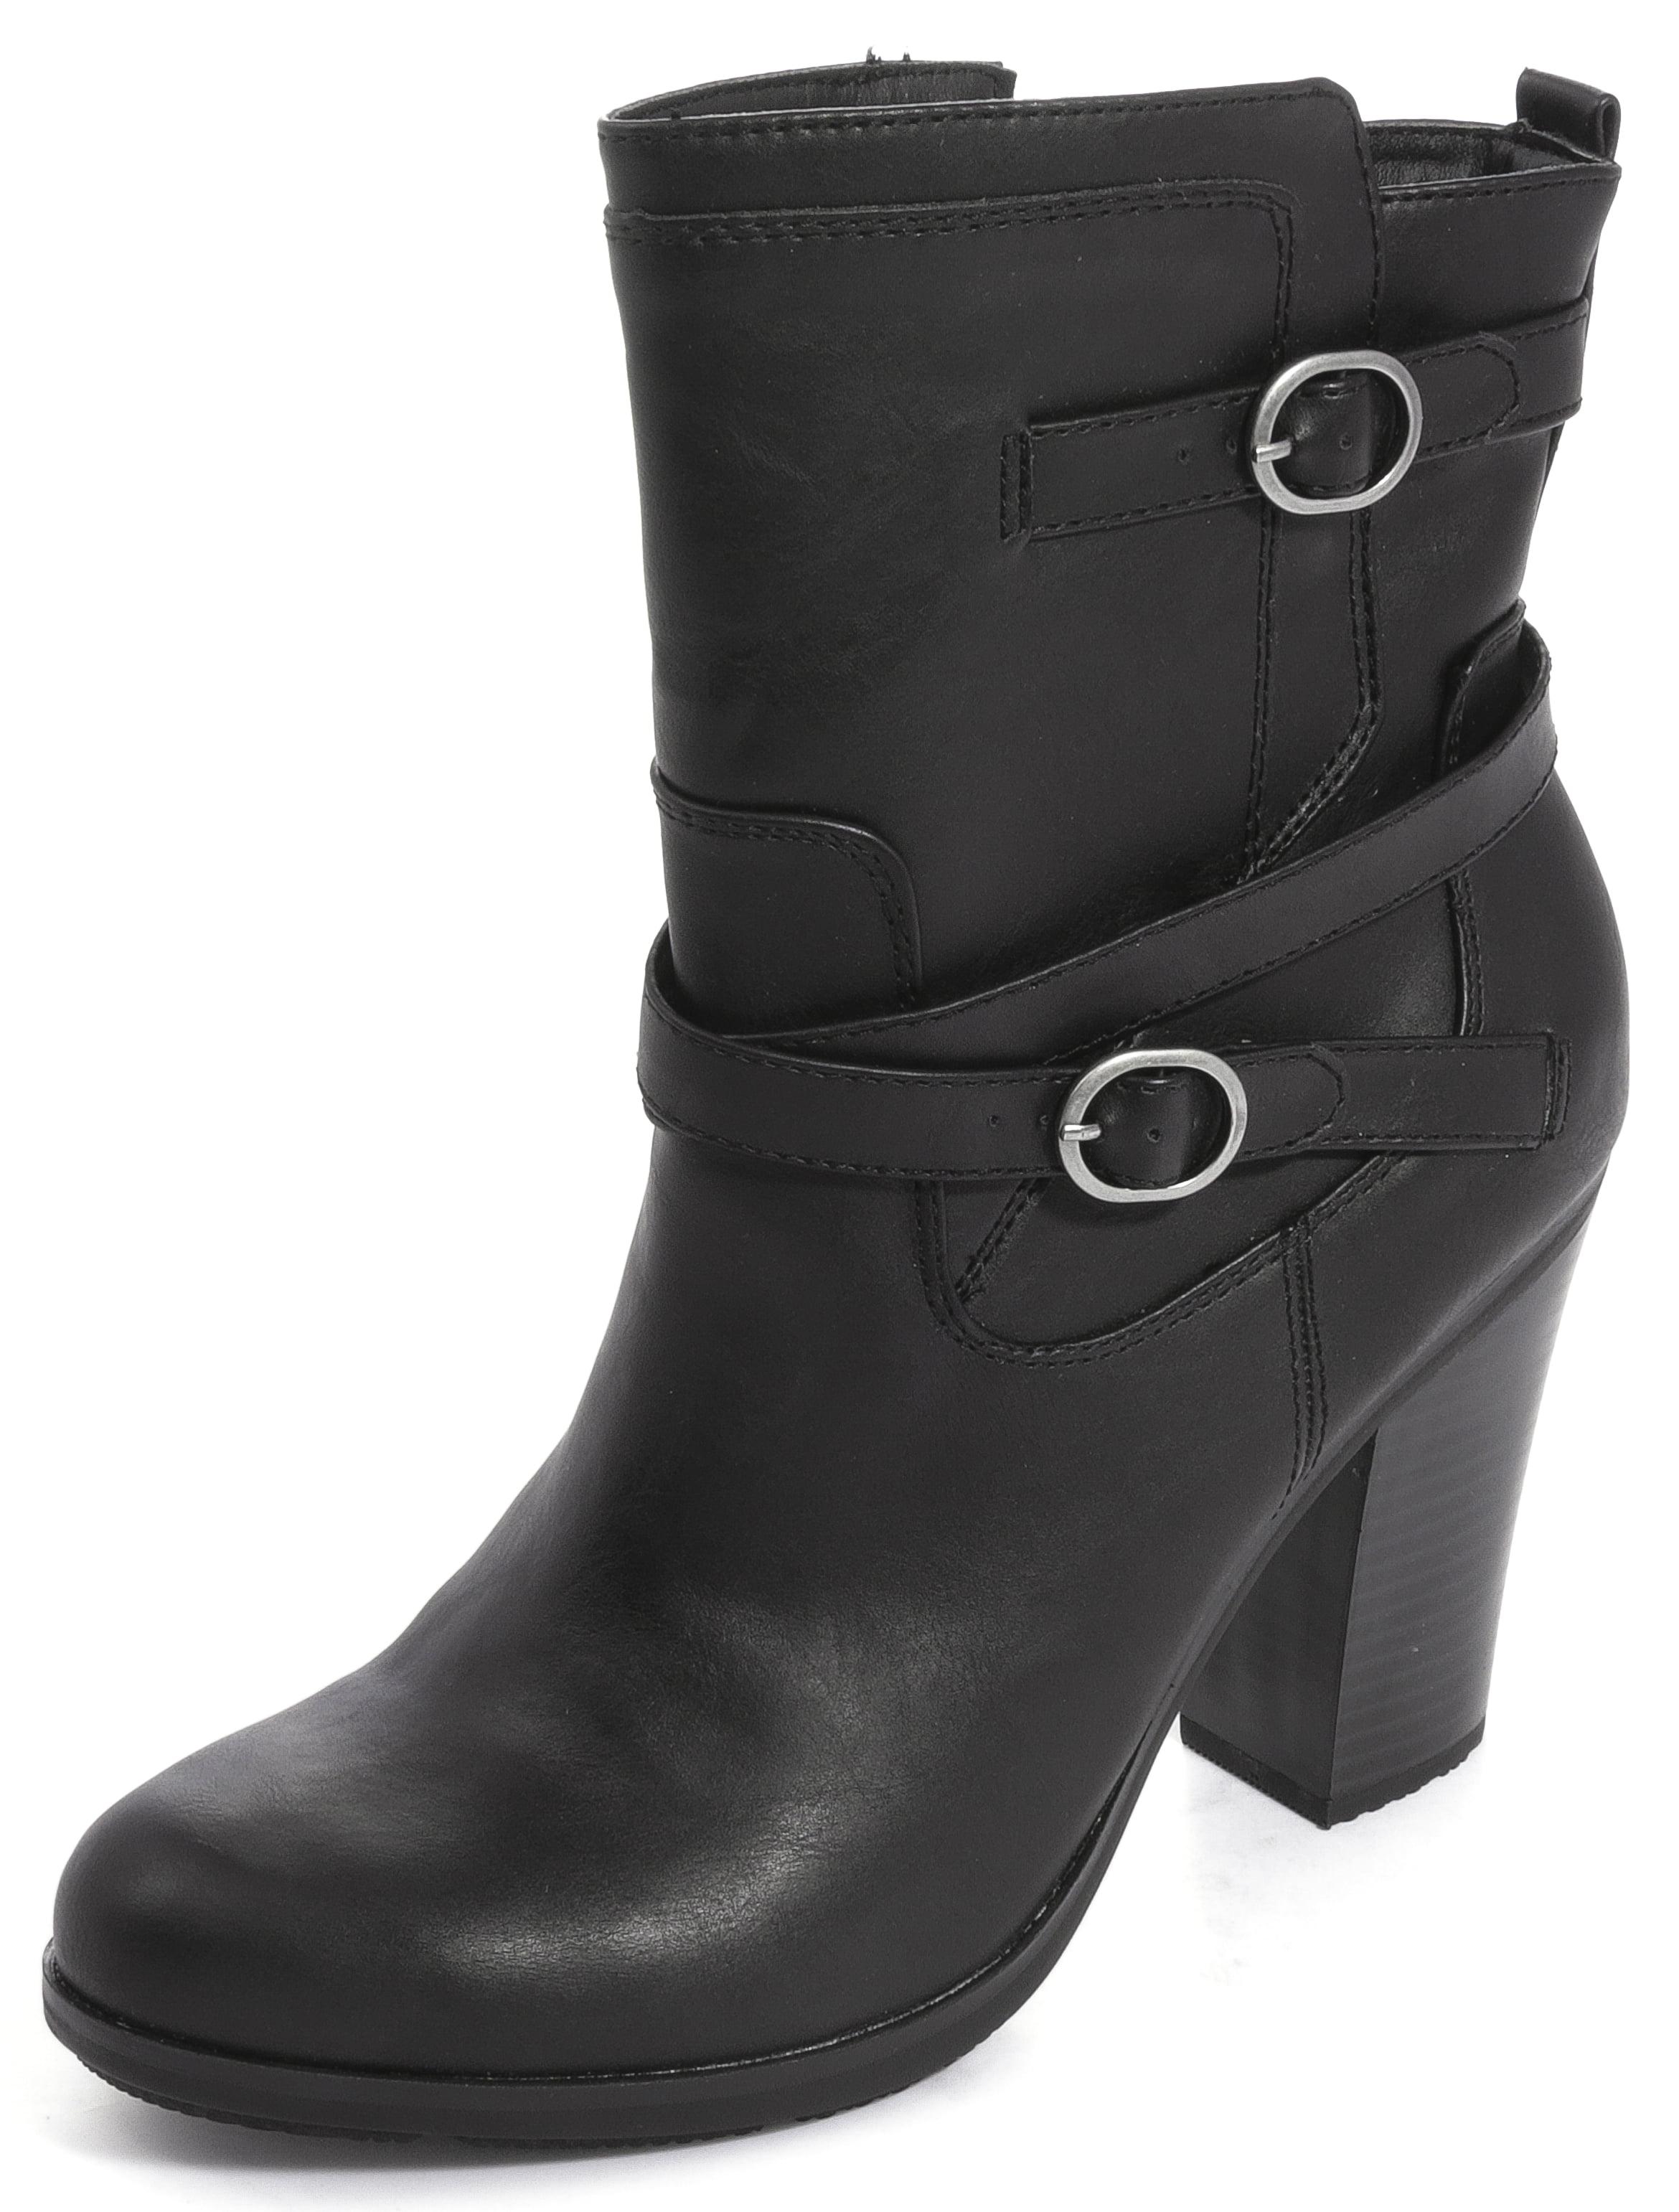 Womens Ameliya Round Toe Ankle Fashion Boots